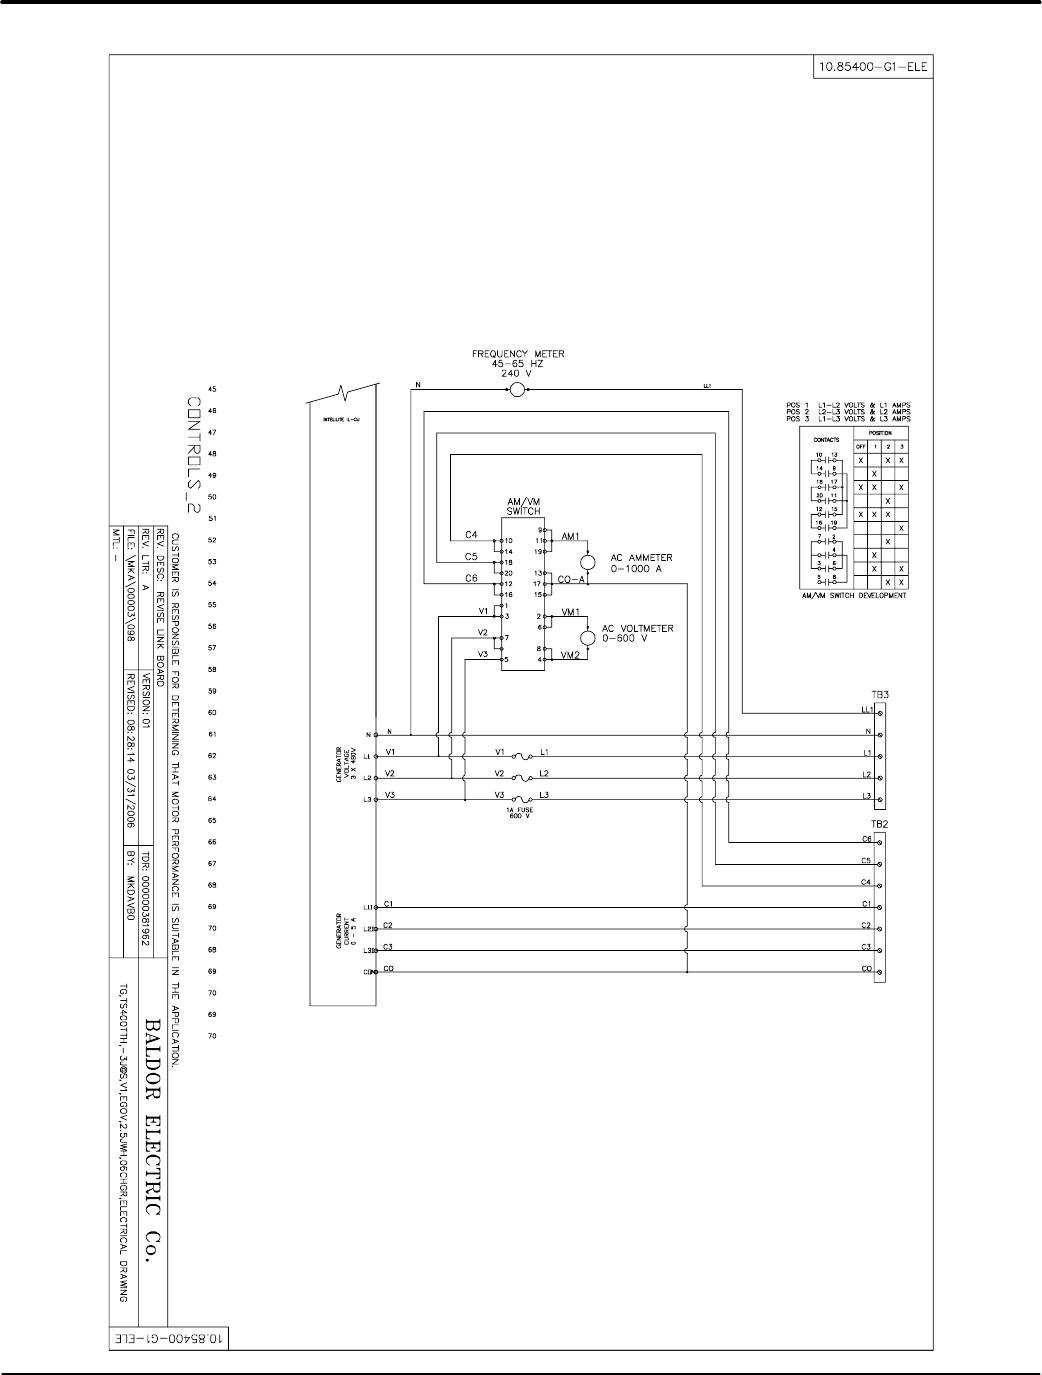 Baldor Ts35 Mn2417 Tier 2 3 Towable Generators User Manual To The High Efficiency Wiring Diagram A 34 Diagrams